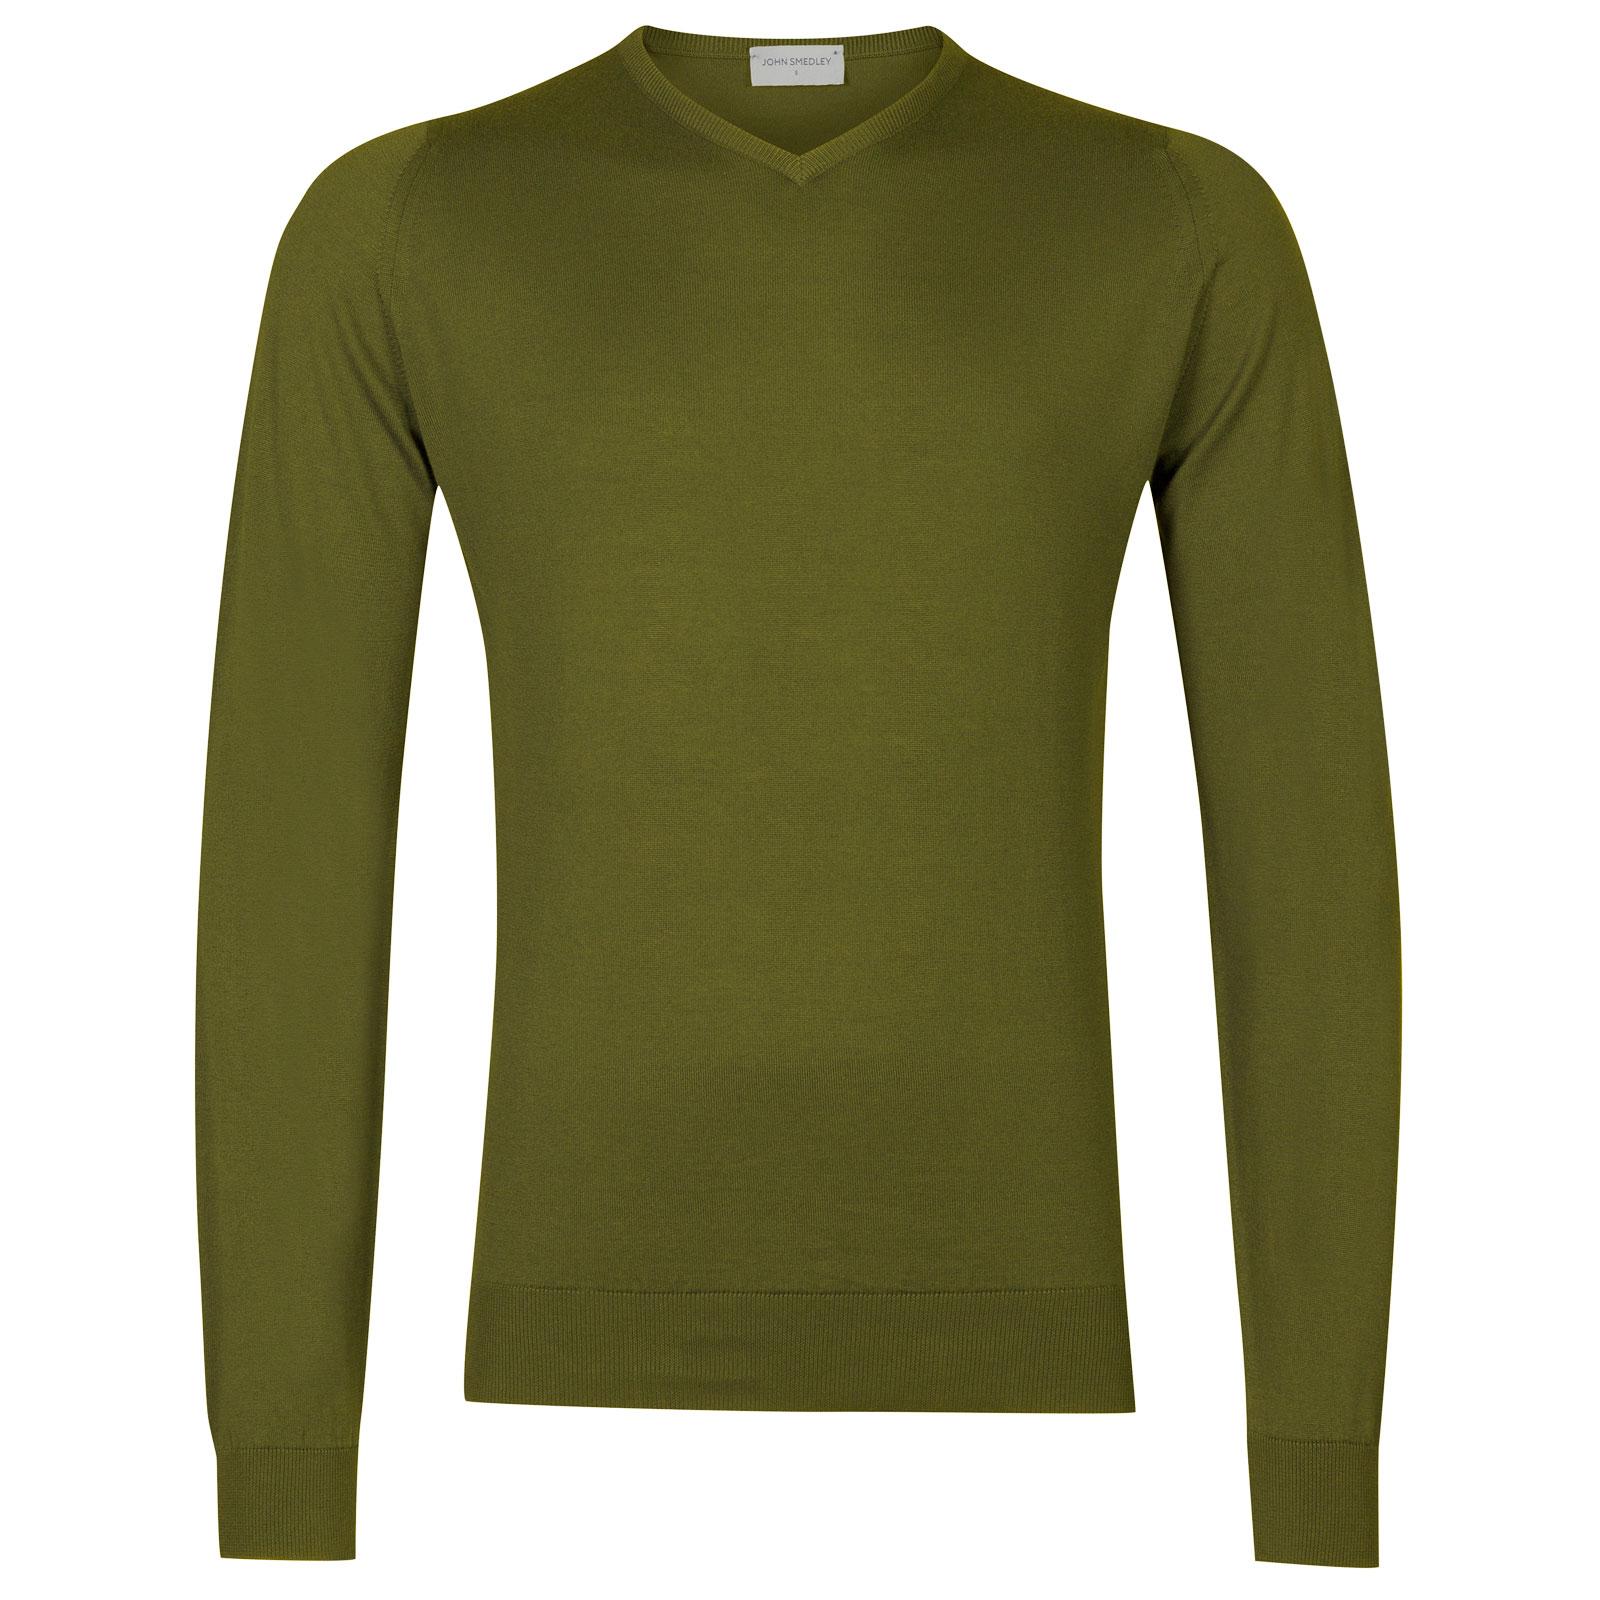 John Smedley Aydon Sea Island Cotton Pullover in Lumsdale Green-XL